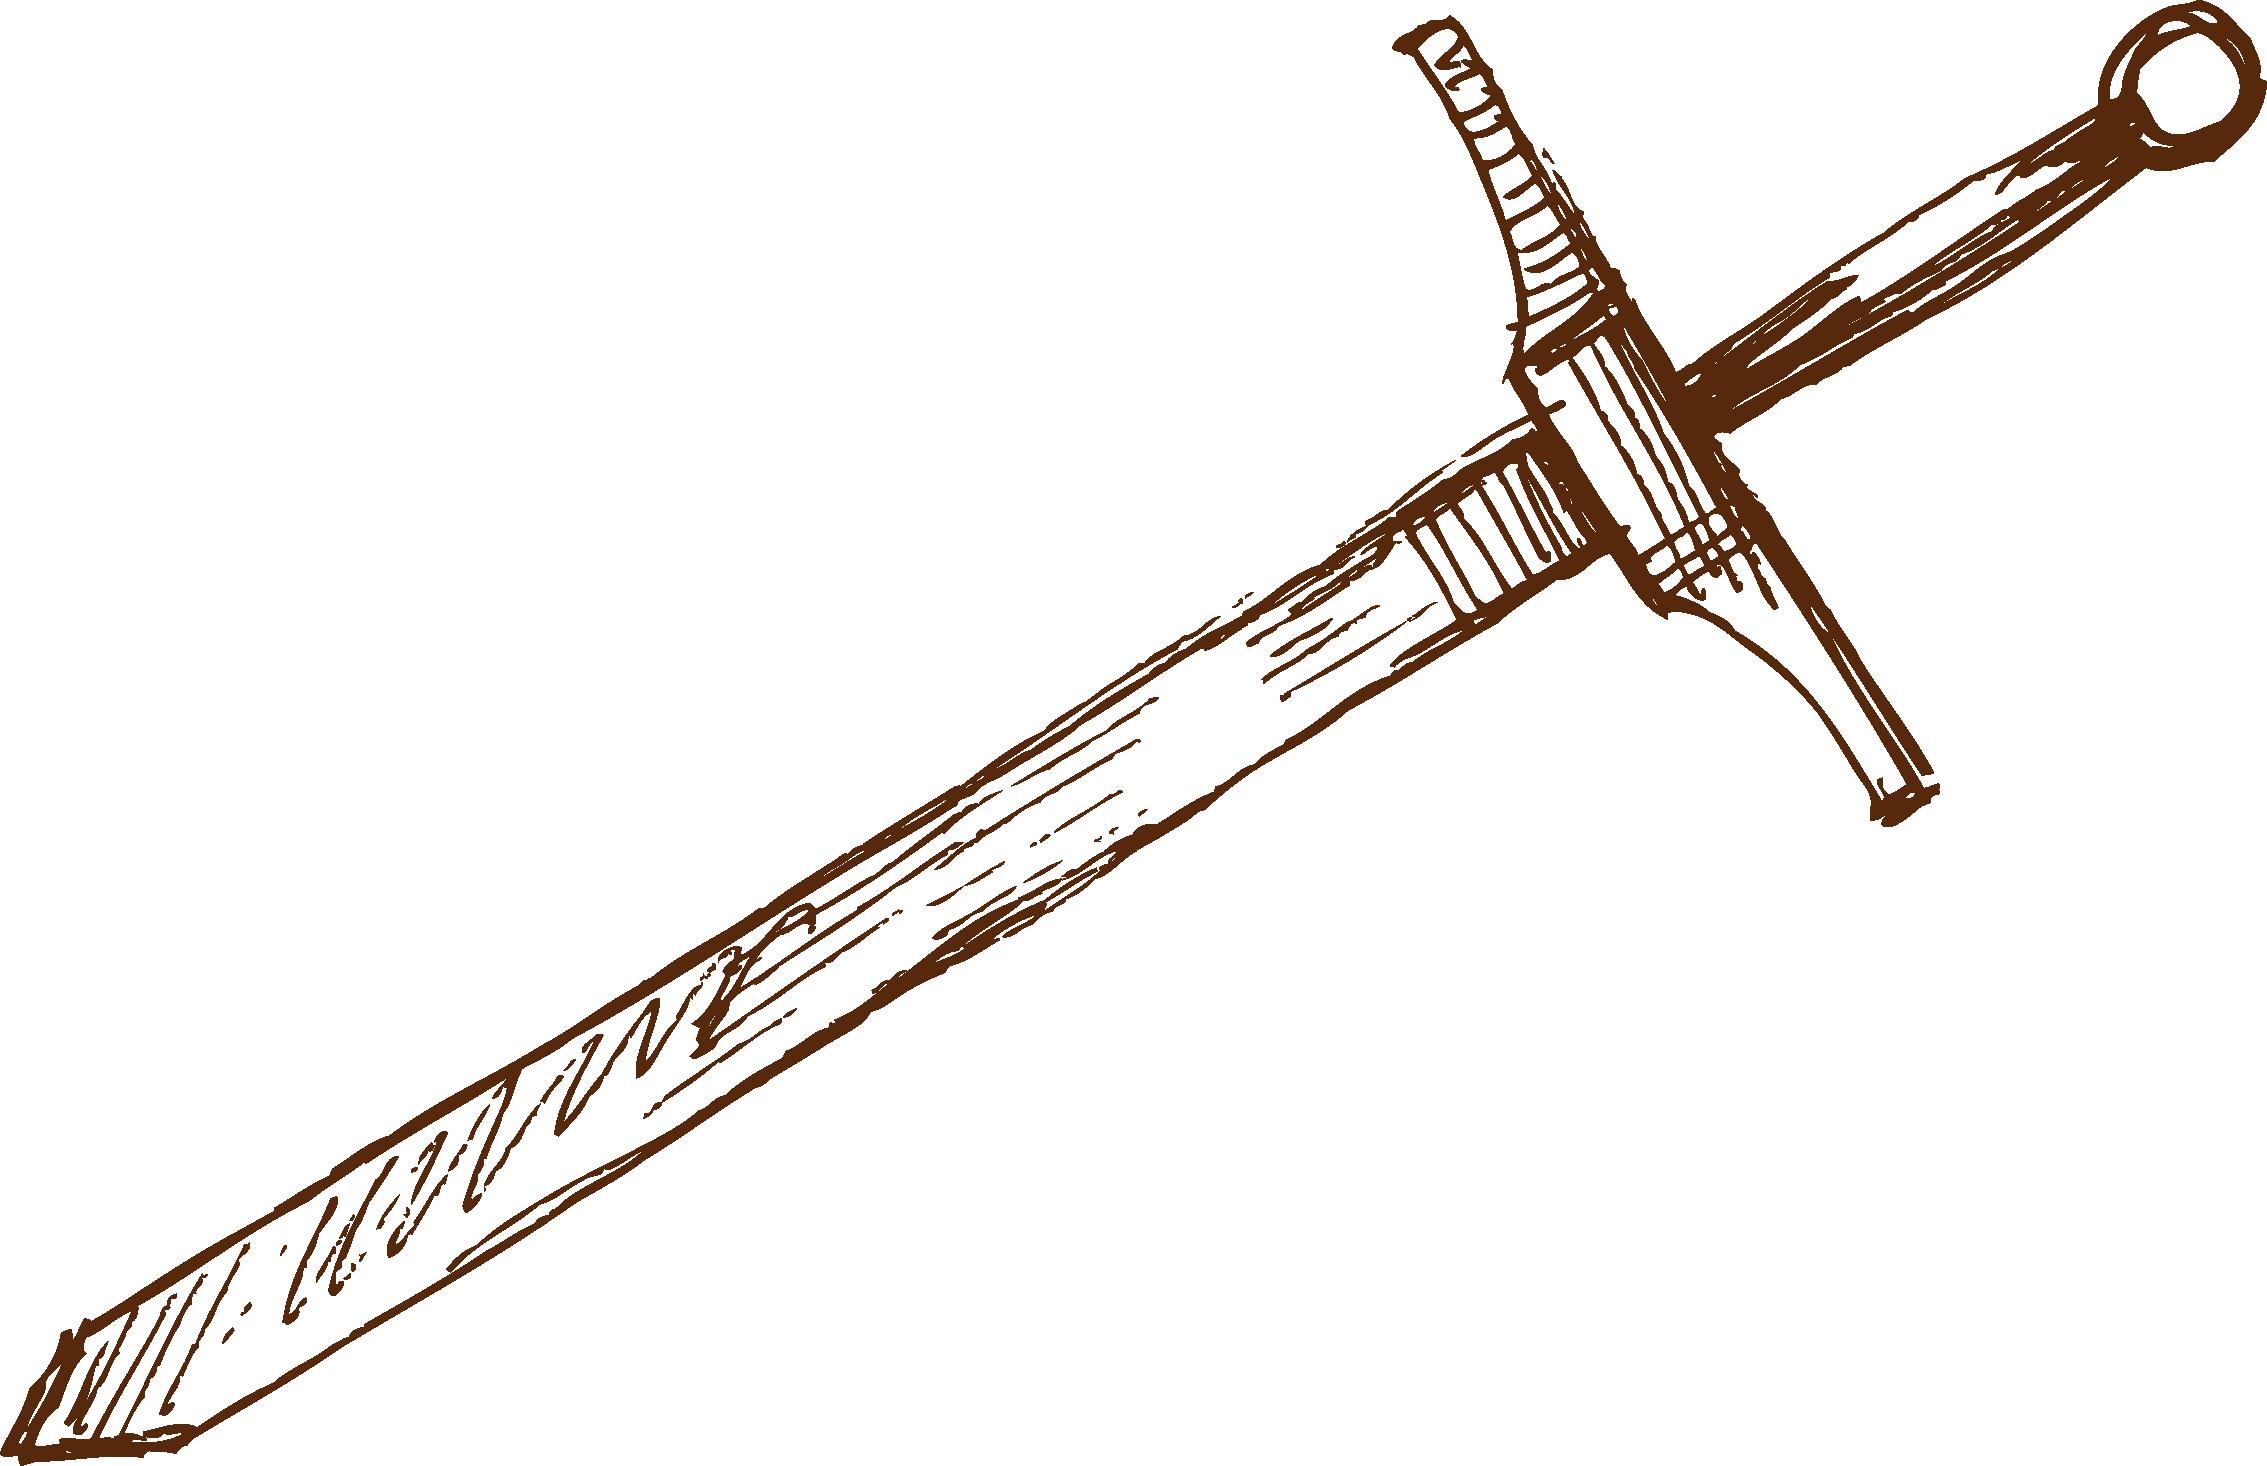 Suit of swords Clip art.